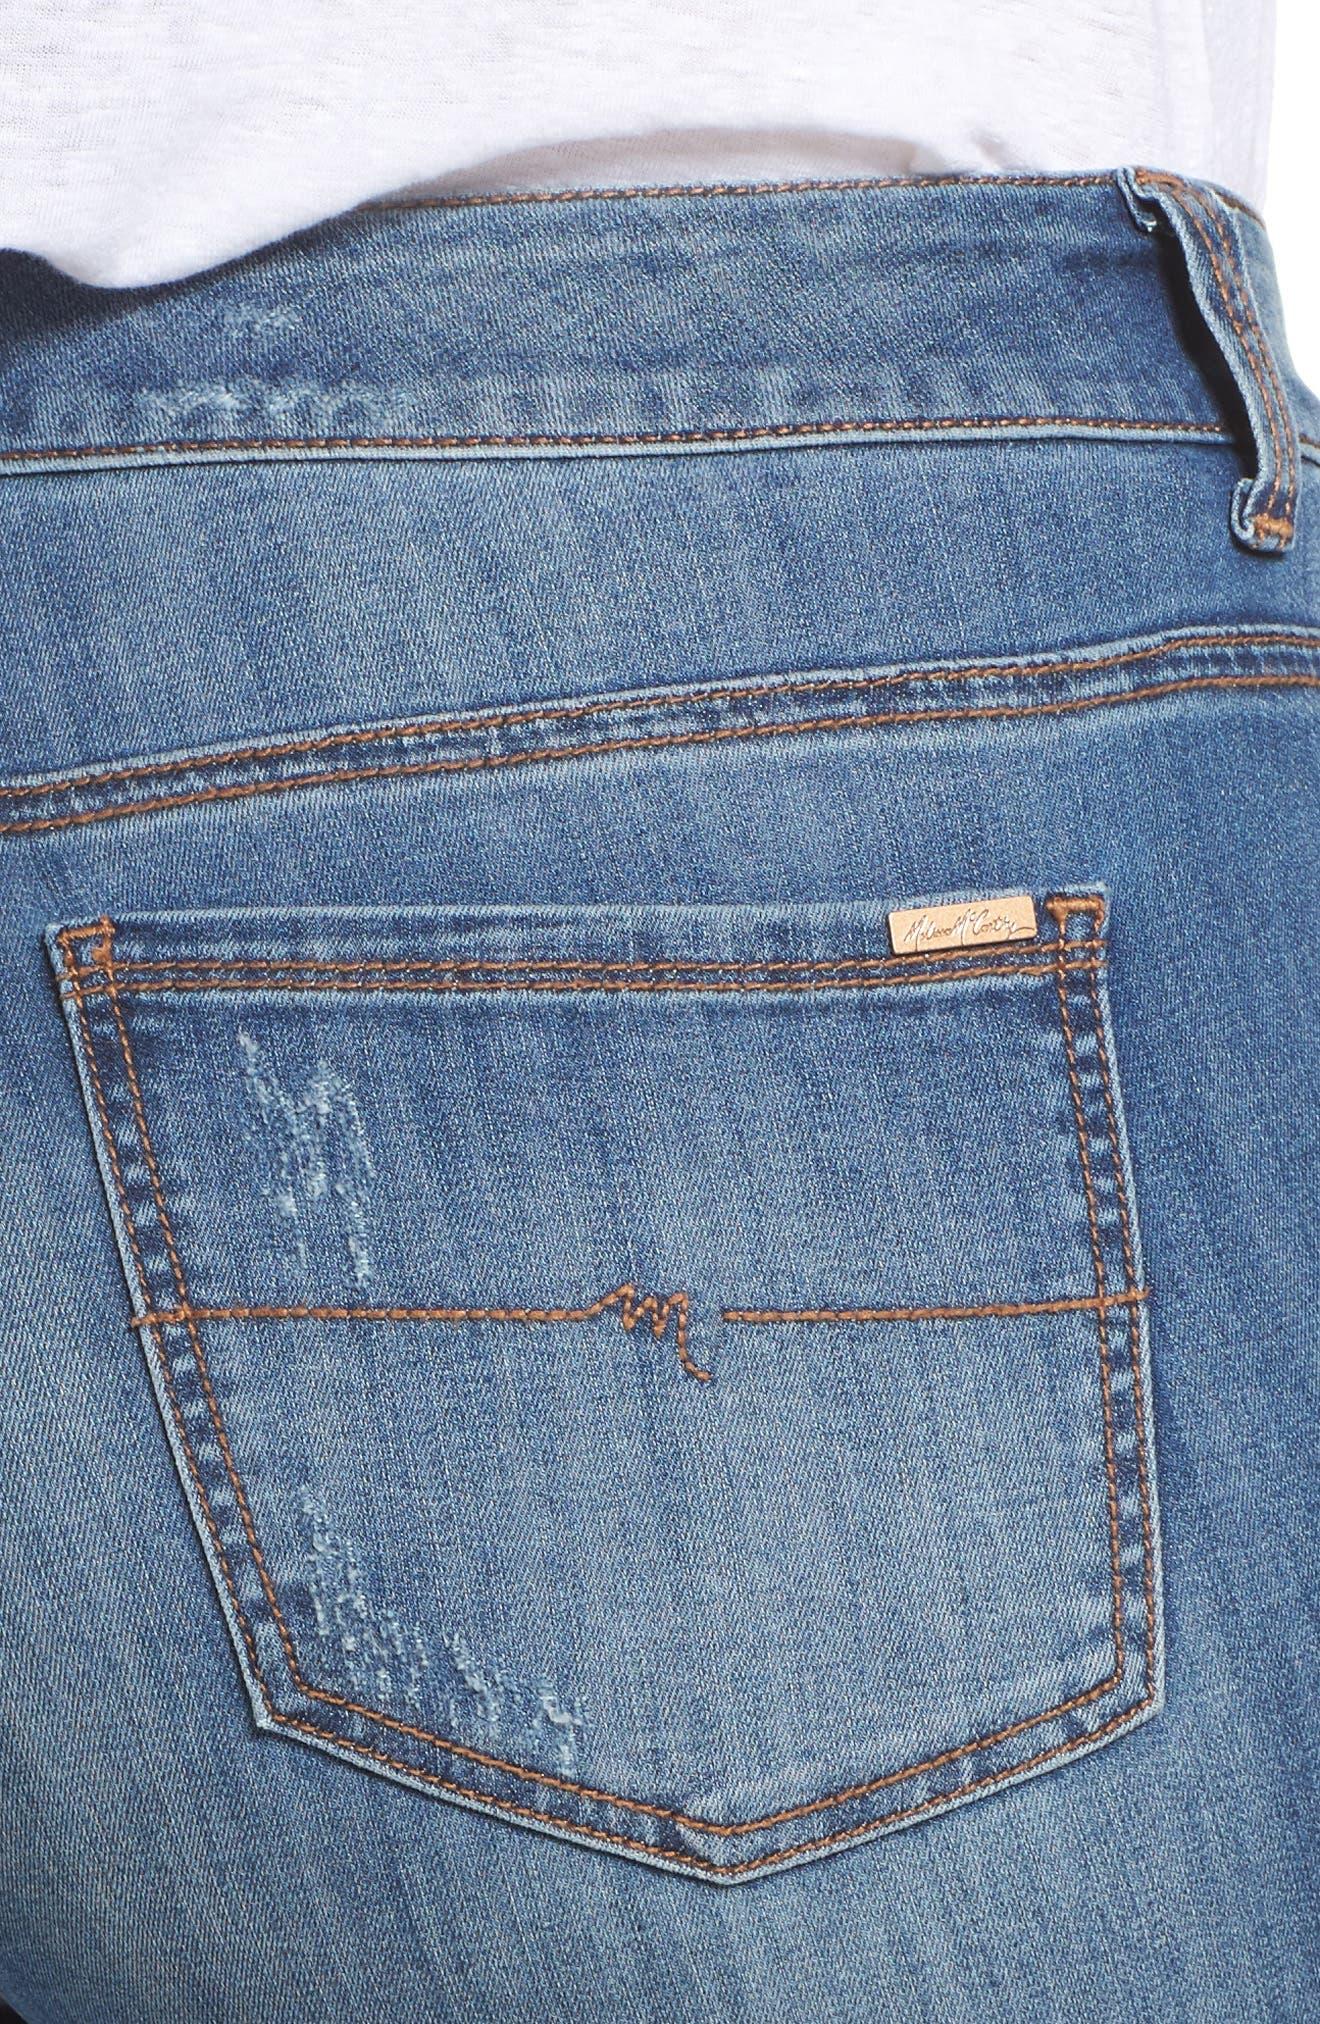 Jeweled Skinny Jeans,                             Alternate thumbnail 4, color,                             450